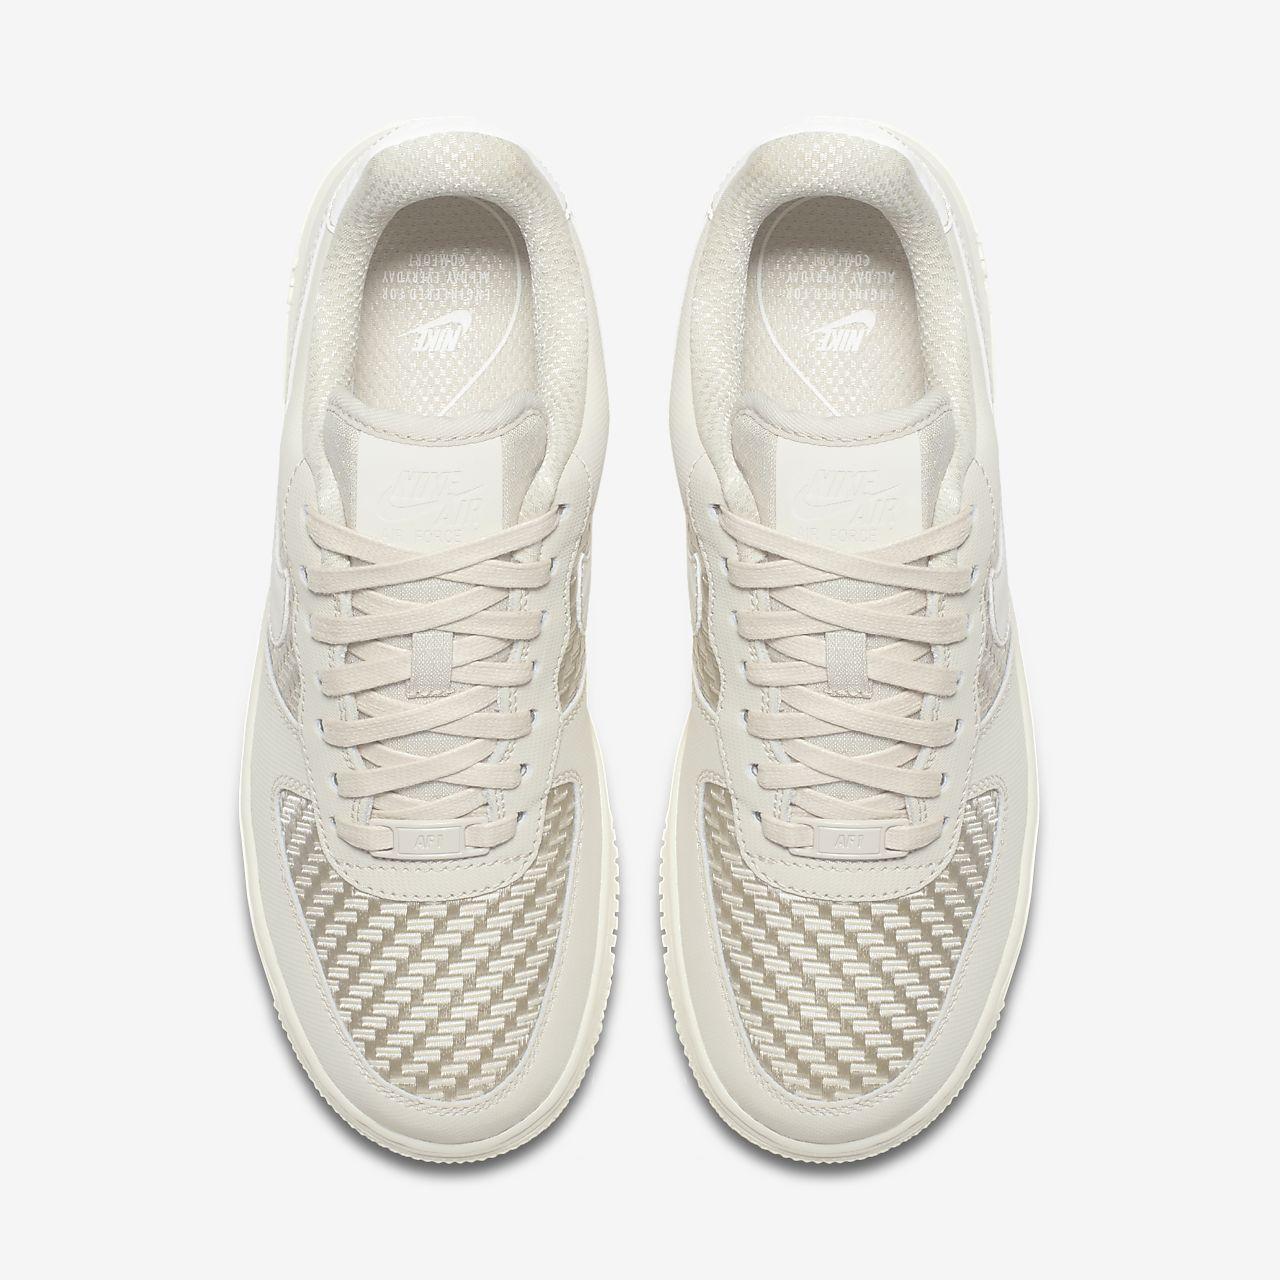 timeless design 2c5f5 d3f4d ... Ivory Metallic Red Bronze Dark Stucco AA3968 ... Nike Air Force 1 07  Pinnacle Womens Shoe ... Nike Air Force 1 07 Pinnacle Womens Shoe ...